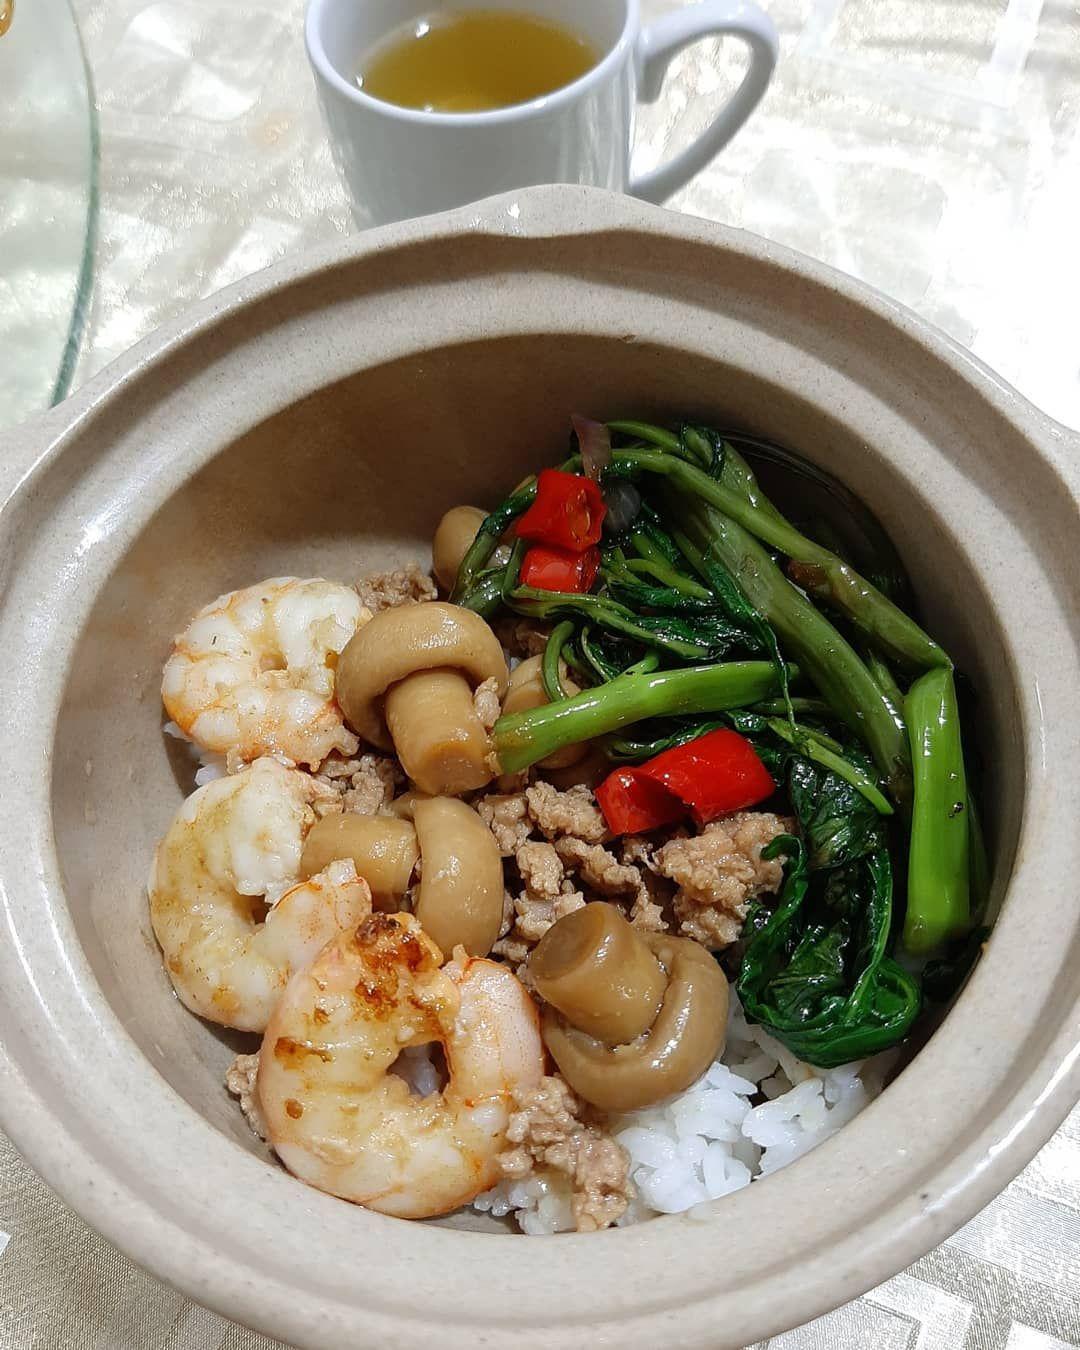 Daging Cha Jamur Tumis Kangkung Resep Siangan Ya Hobimasak Sukamasak Masakanroemahan Masakanrumahan Masakanr Recipes Workout Food Food